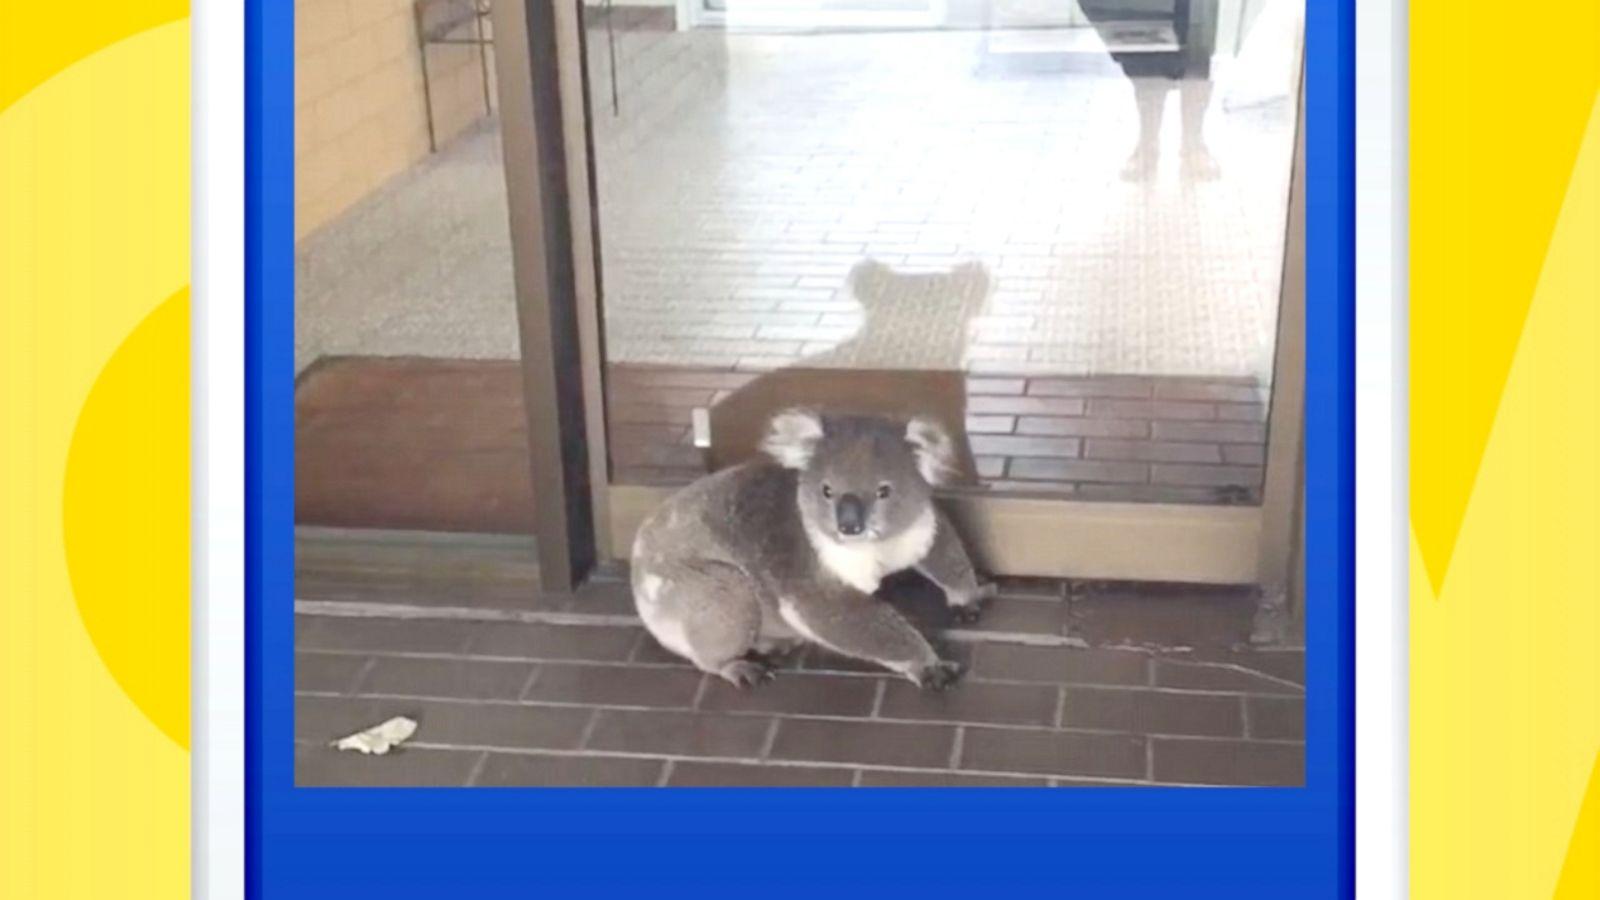 Koala wanders into accounting office in Australia